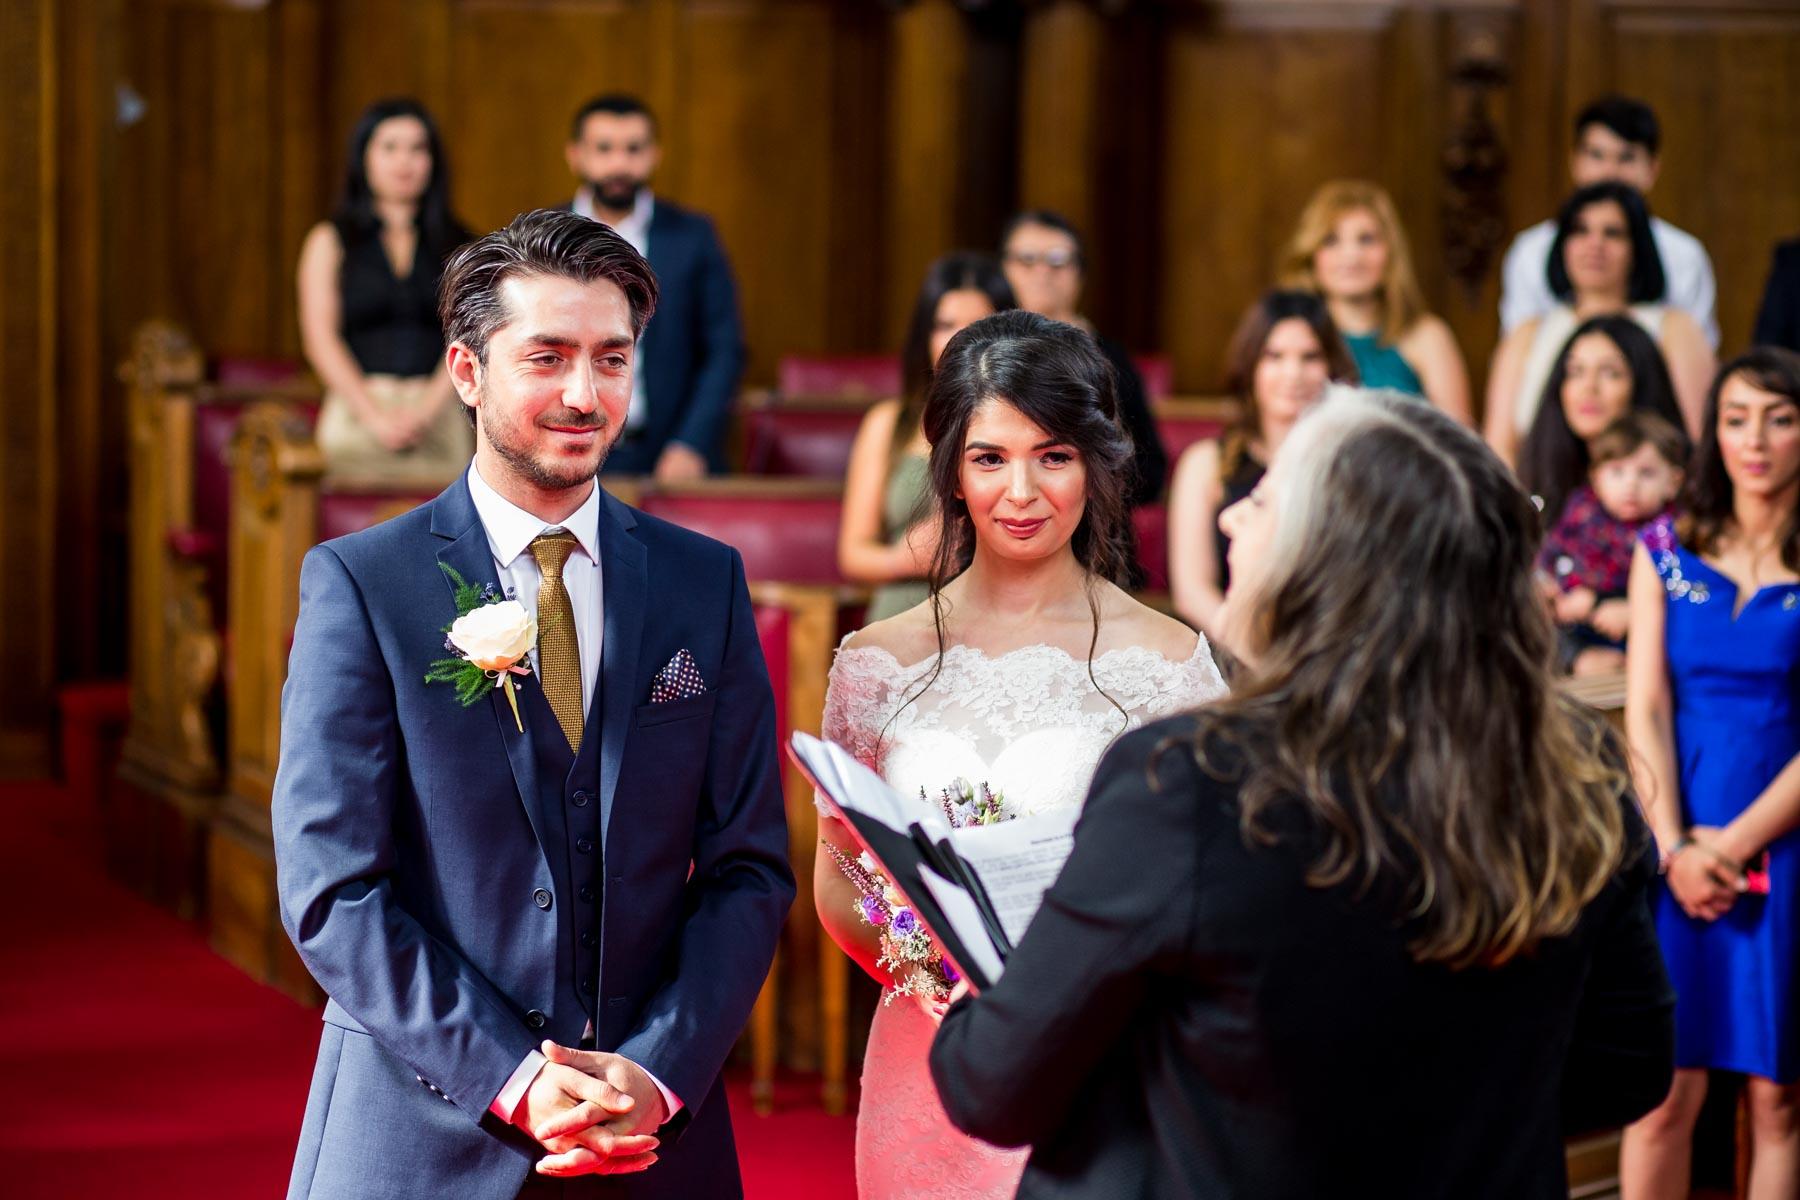 Candid wedding photographer, Islington Town Hall, London